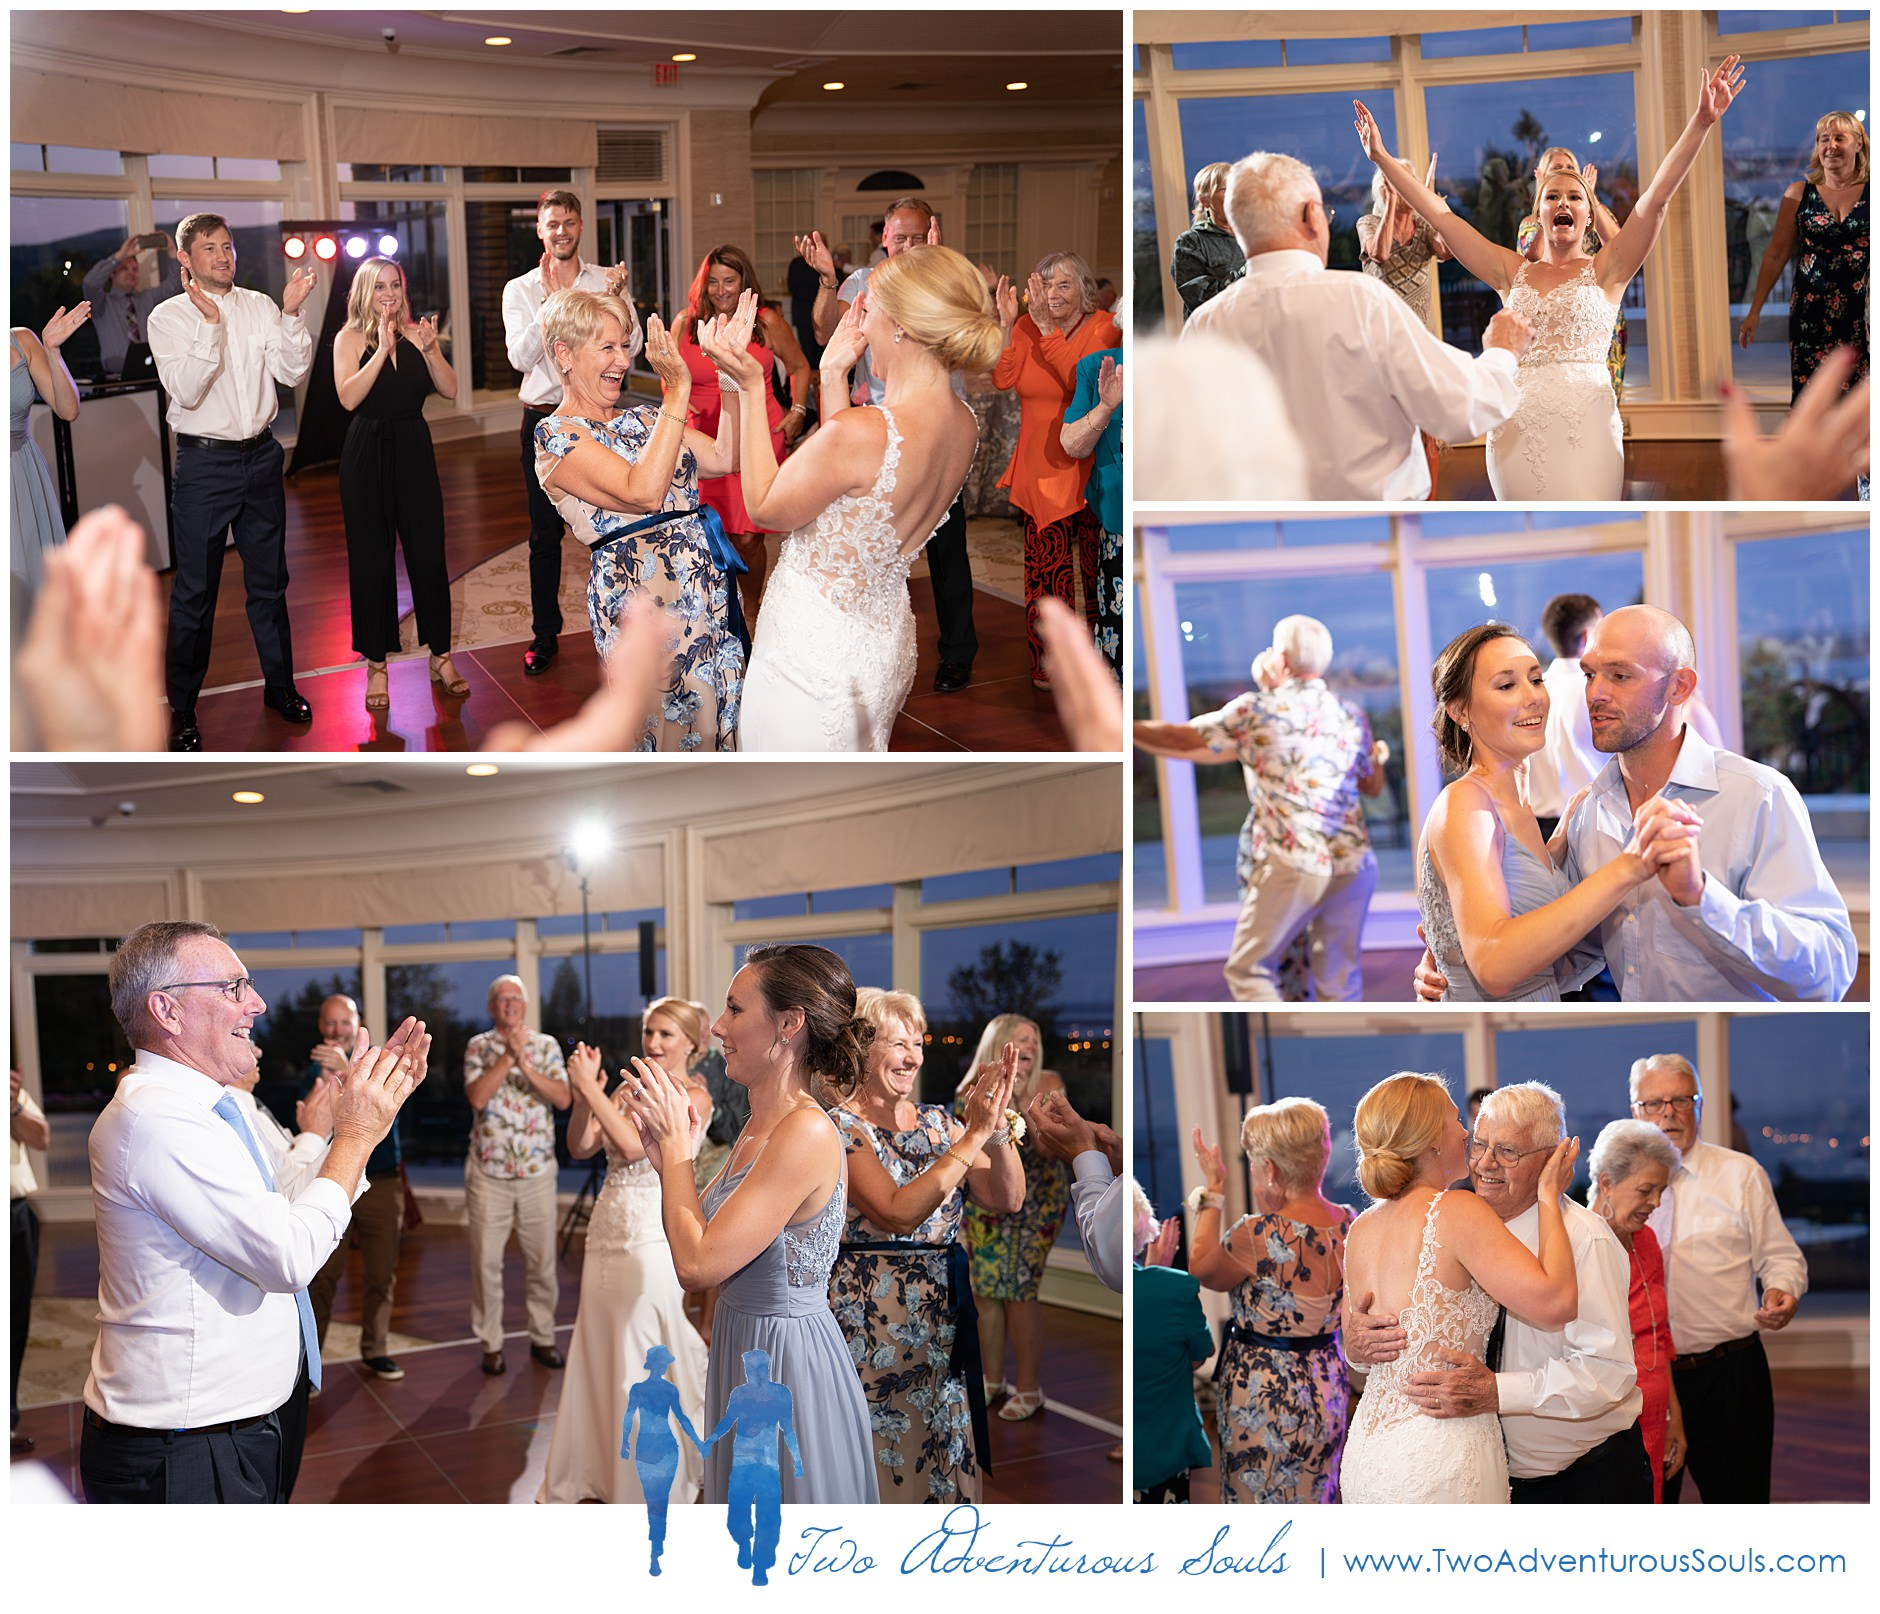 Maine Wedding Photographers, Point Lookout Wedding Photographers, Maine Elopement Photographers, Two Adventurous Souls-0080419_0063.jpg